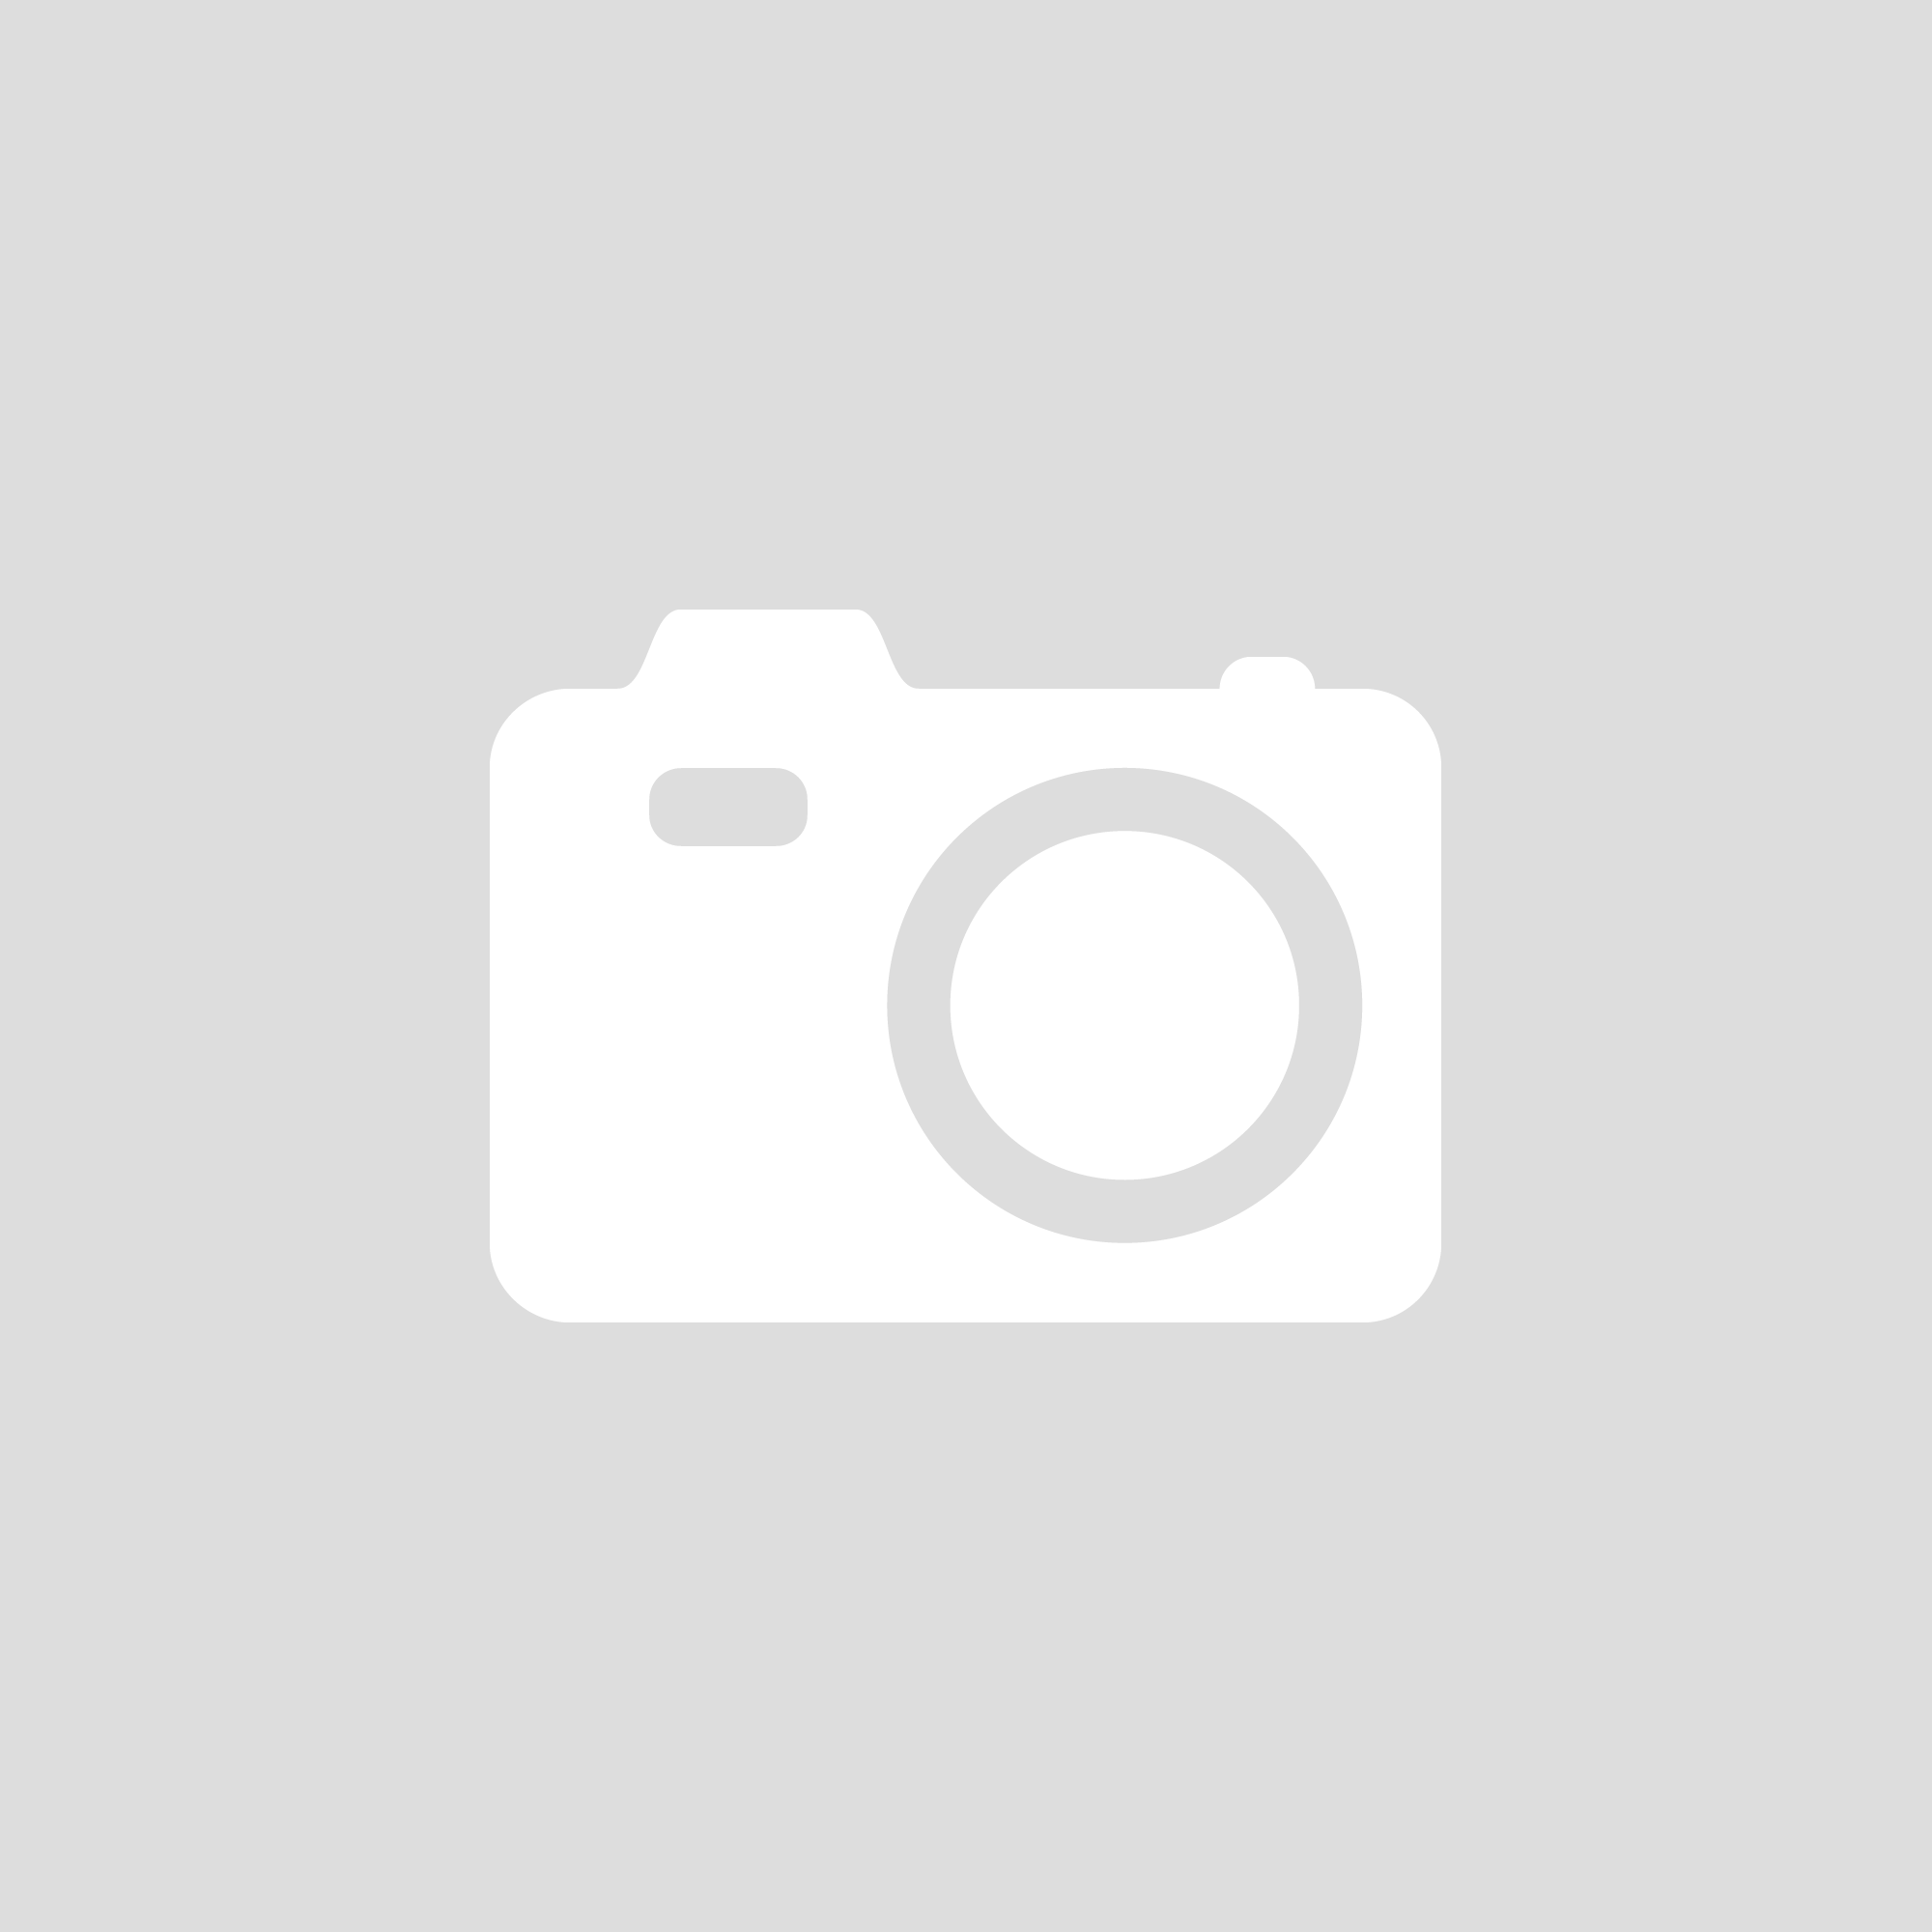 Crystal Tulip Damask Teal Wallpaper by Moda Black Label 242